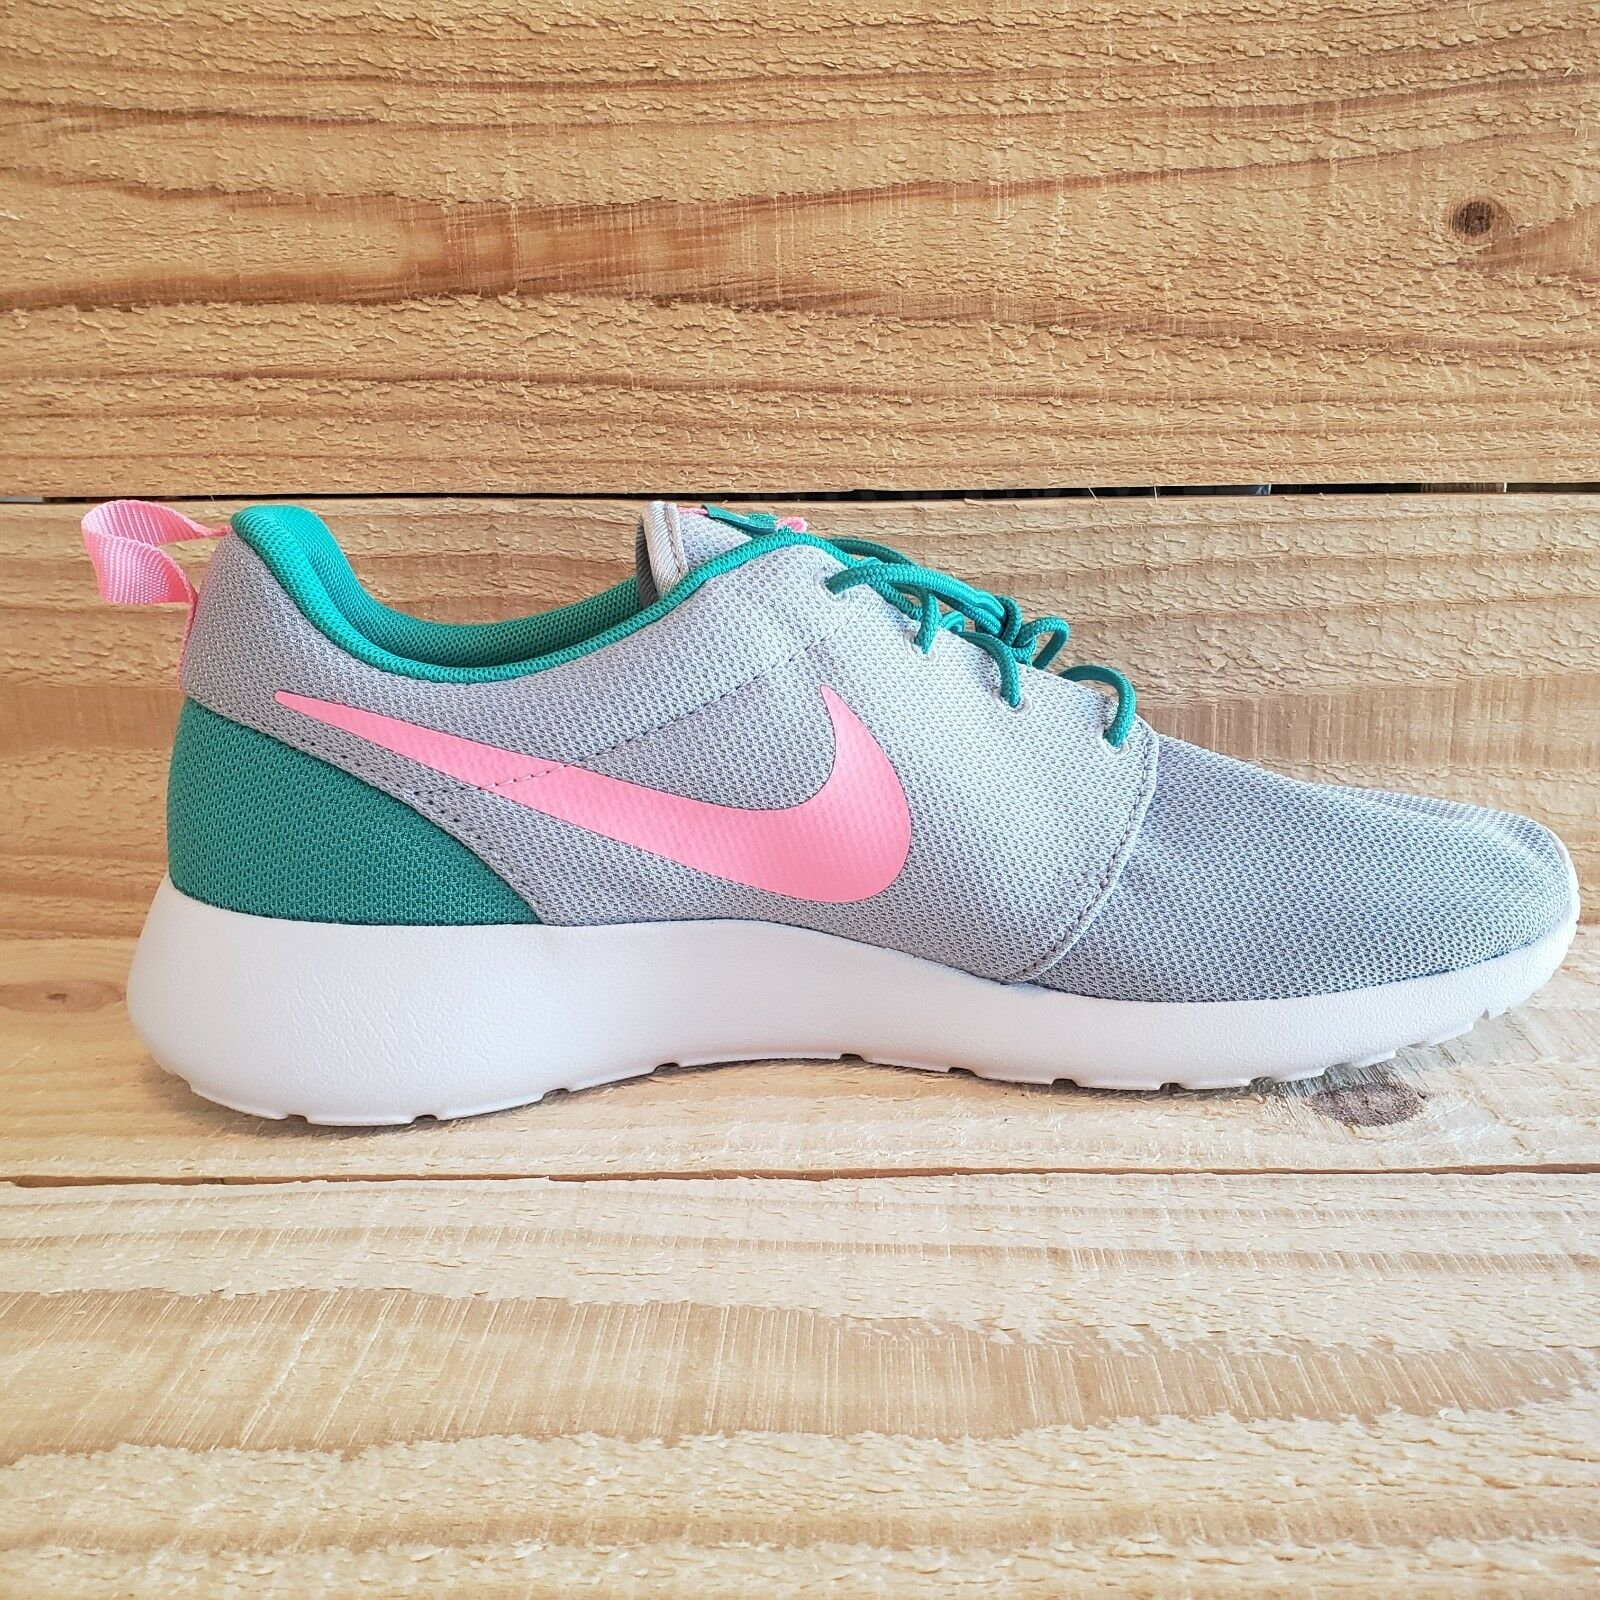 Nike Roshe One Run South Beach Green Pink Pink Pink 511881-036 Size 10.5 Sport Train Grey 1fc59e